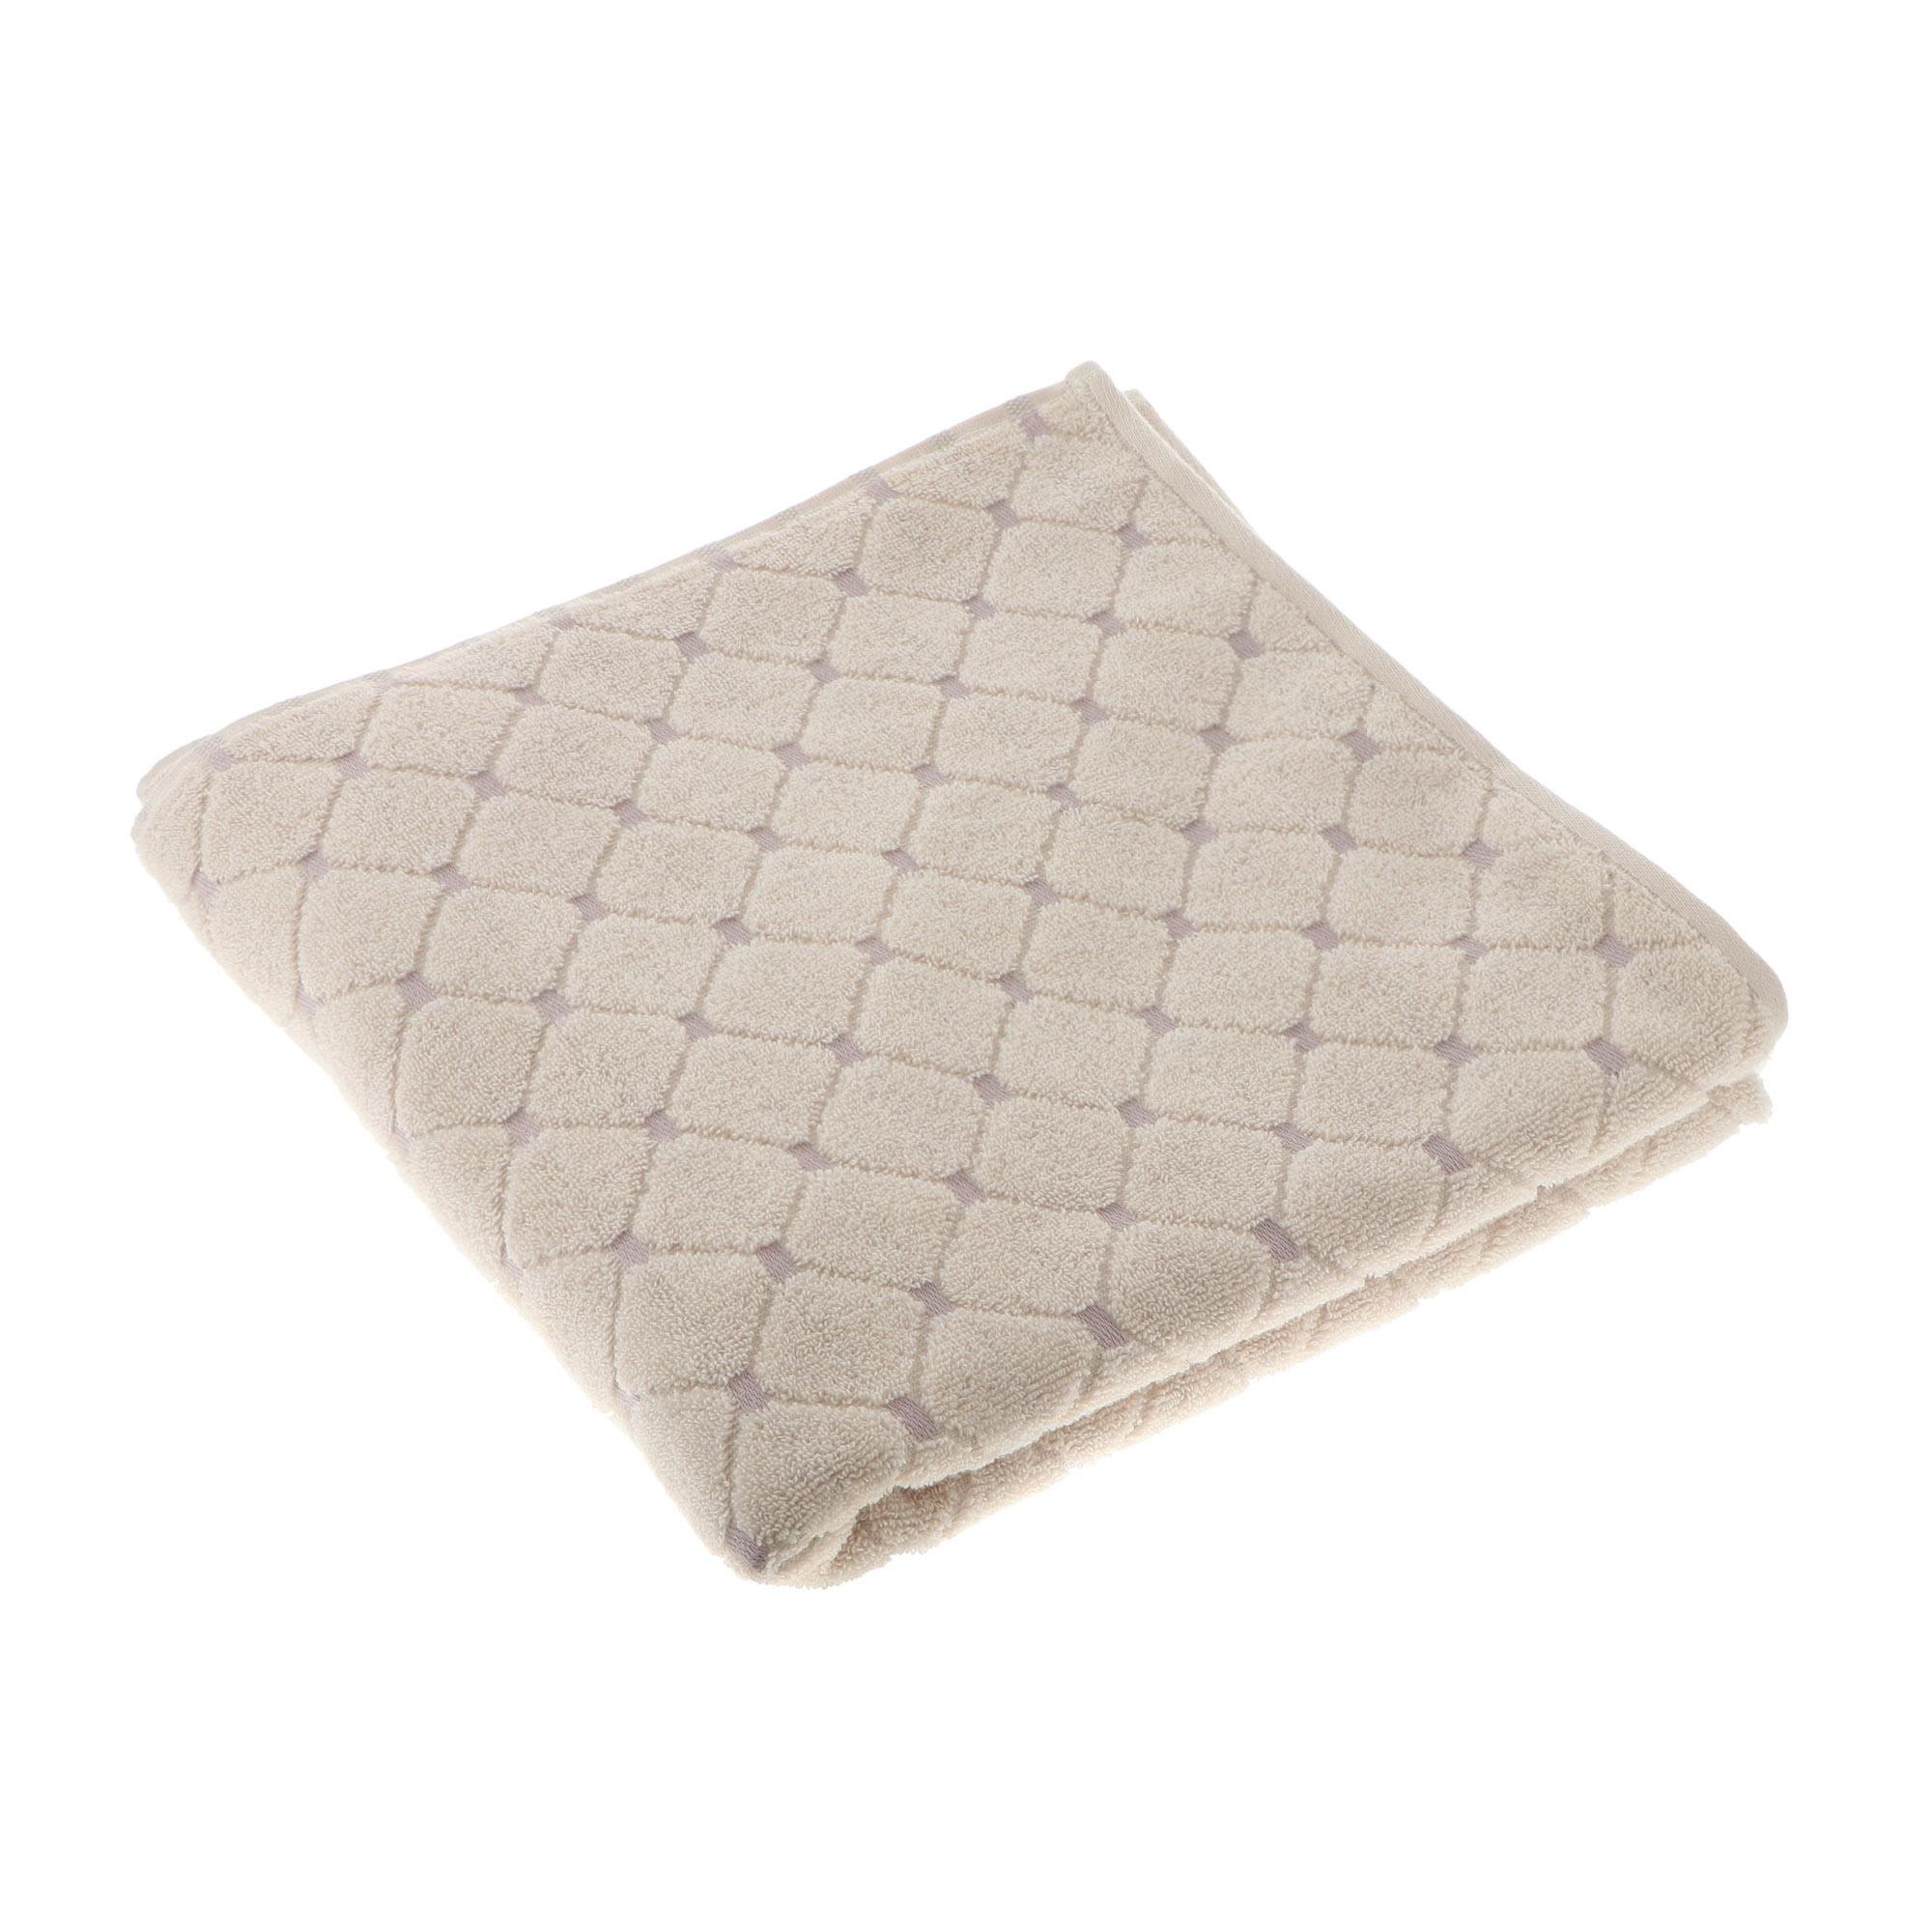 Полотенце махровое Cleanelly Фионда 70х140 молочный фото